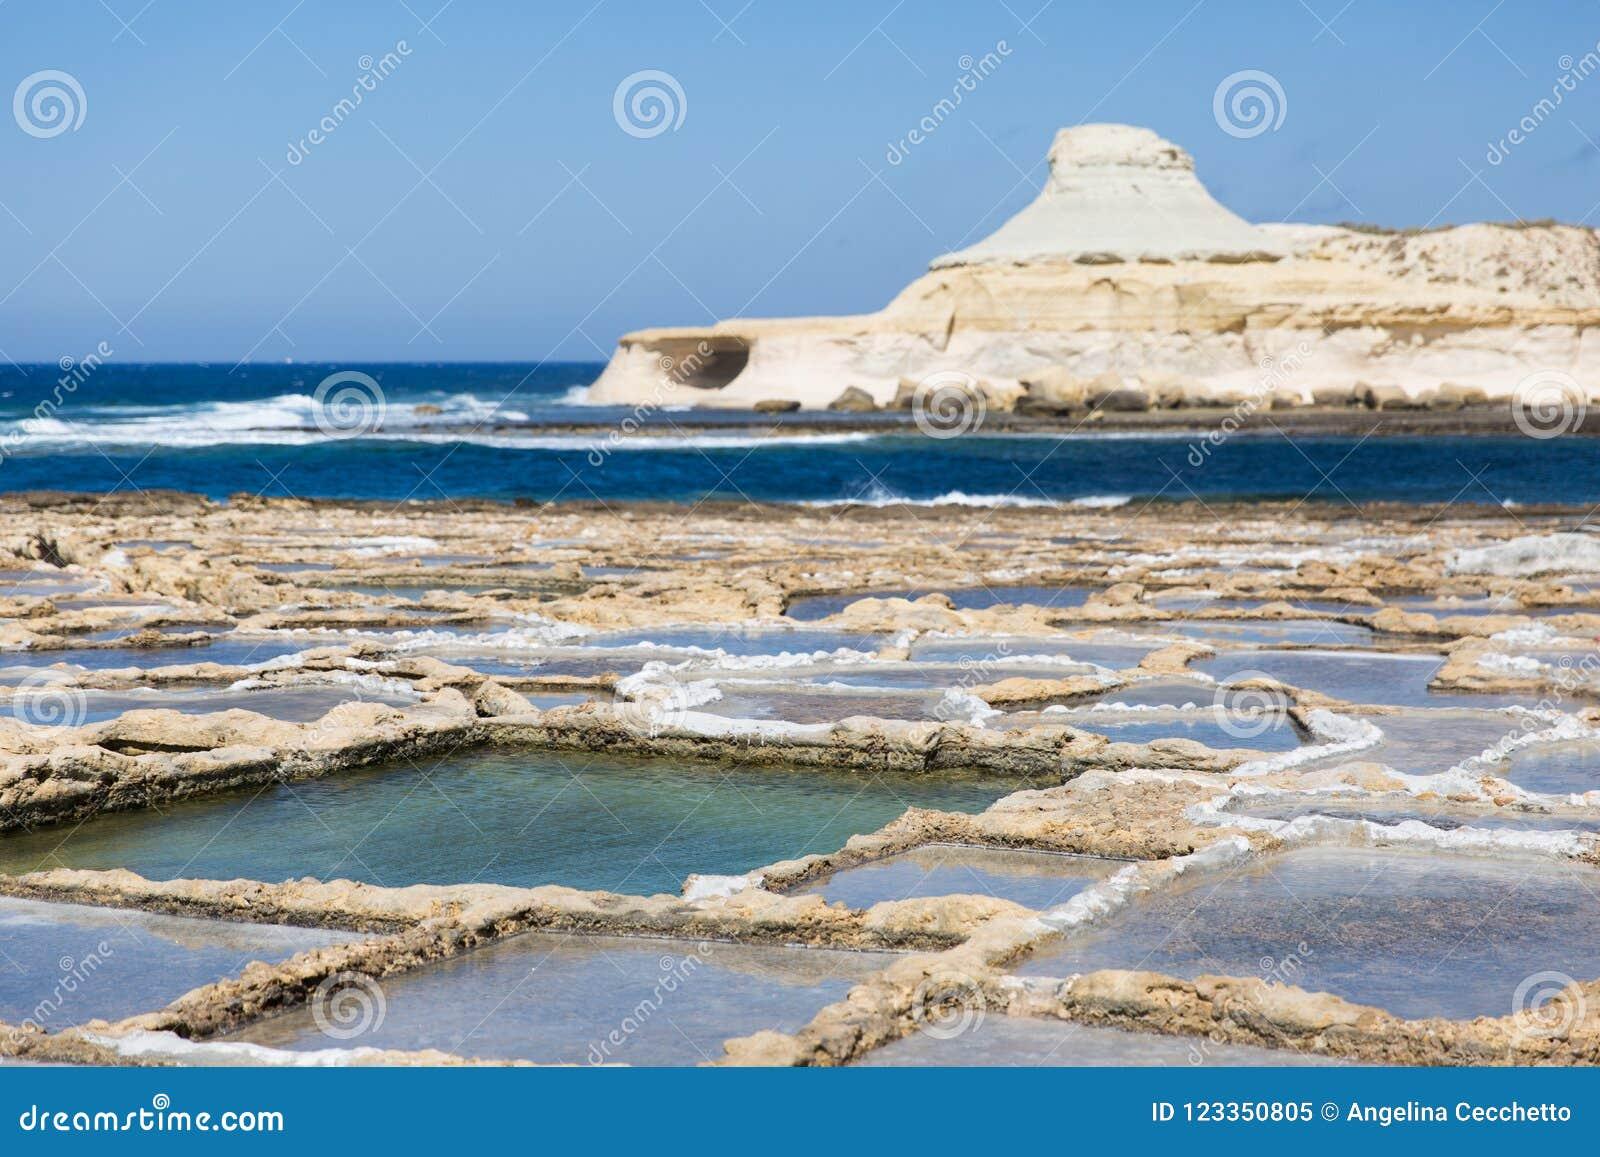 Gozo, Malta has the Azure Window (Tieqa Zerqa) which is a ...   Gozo Limestone